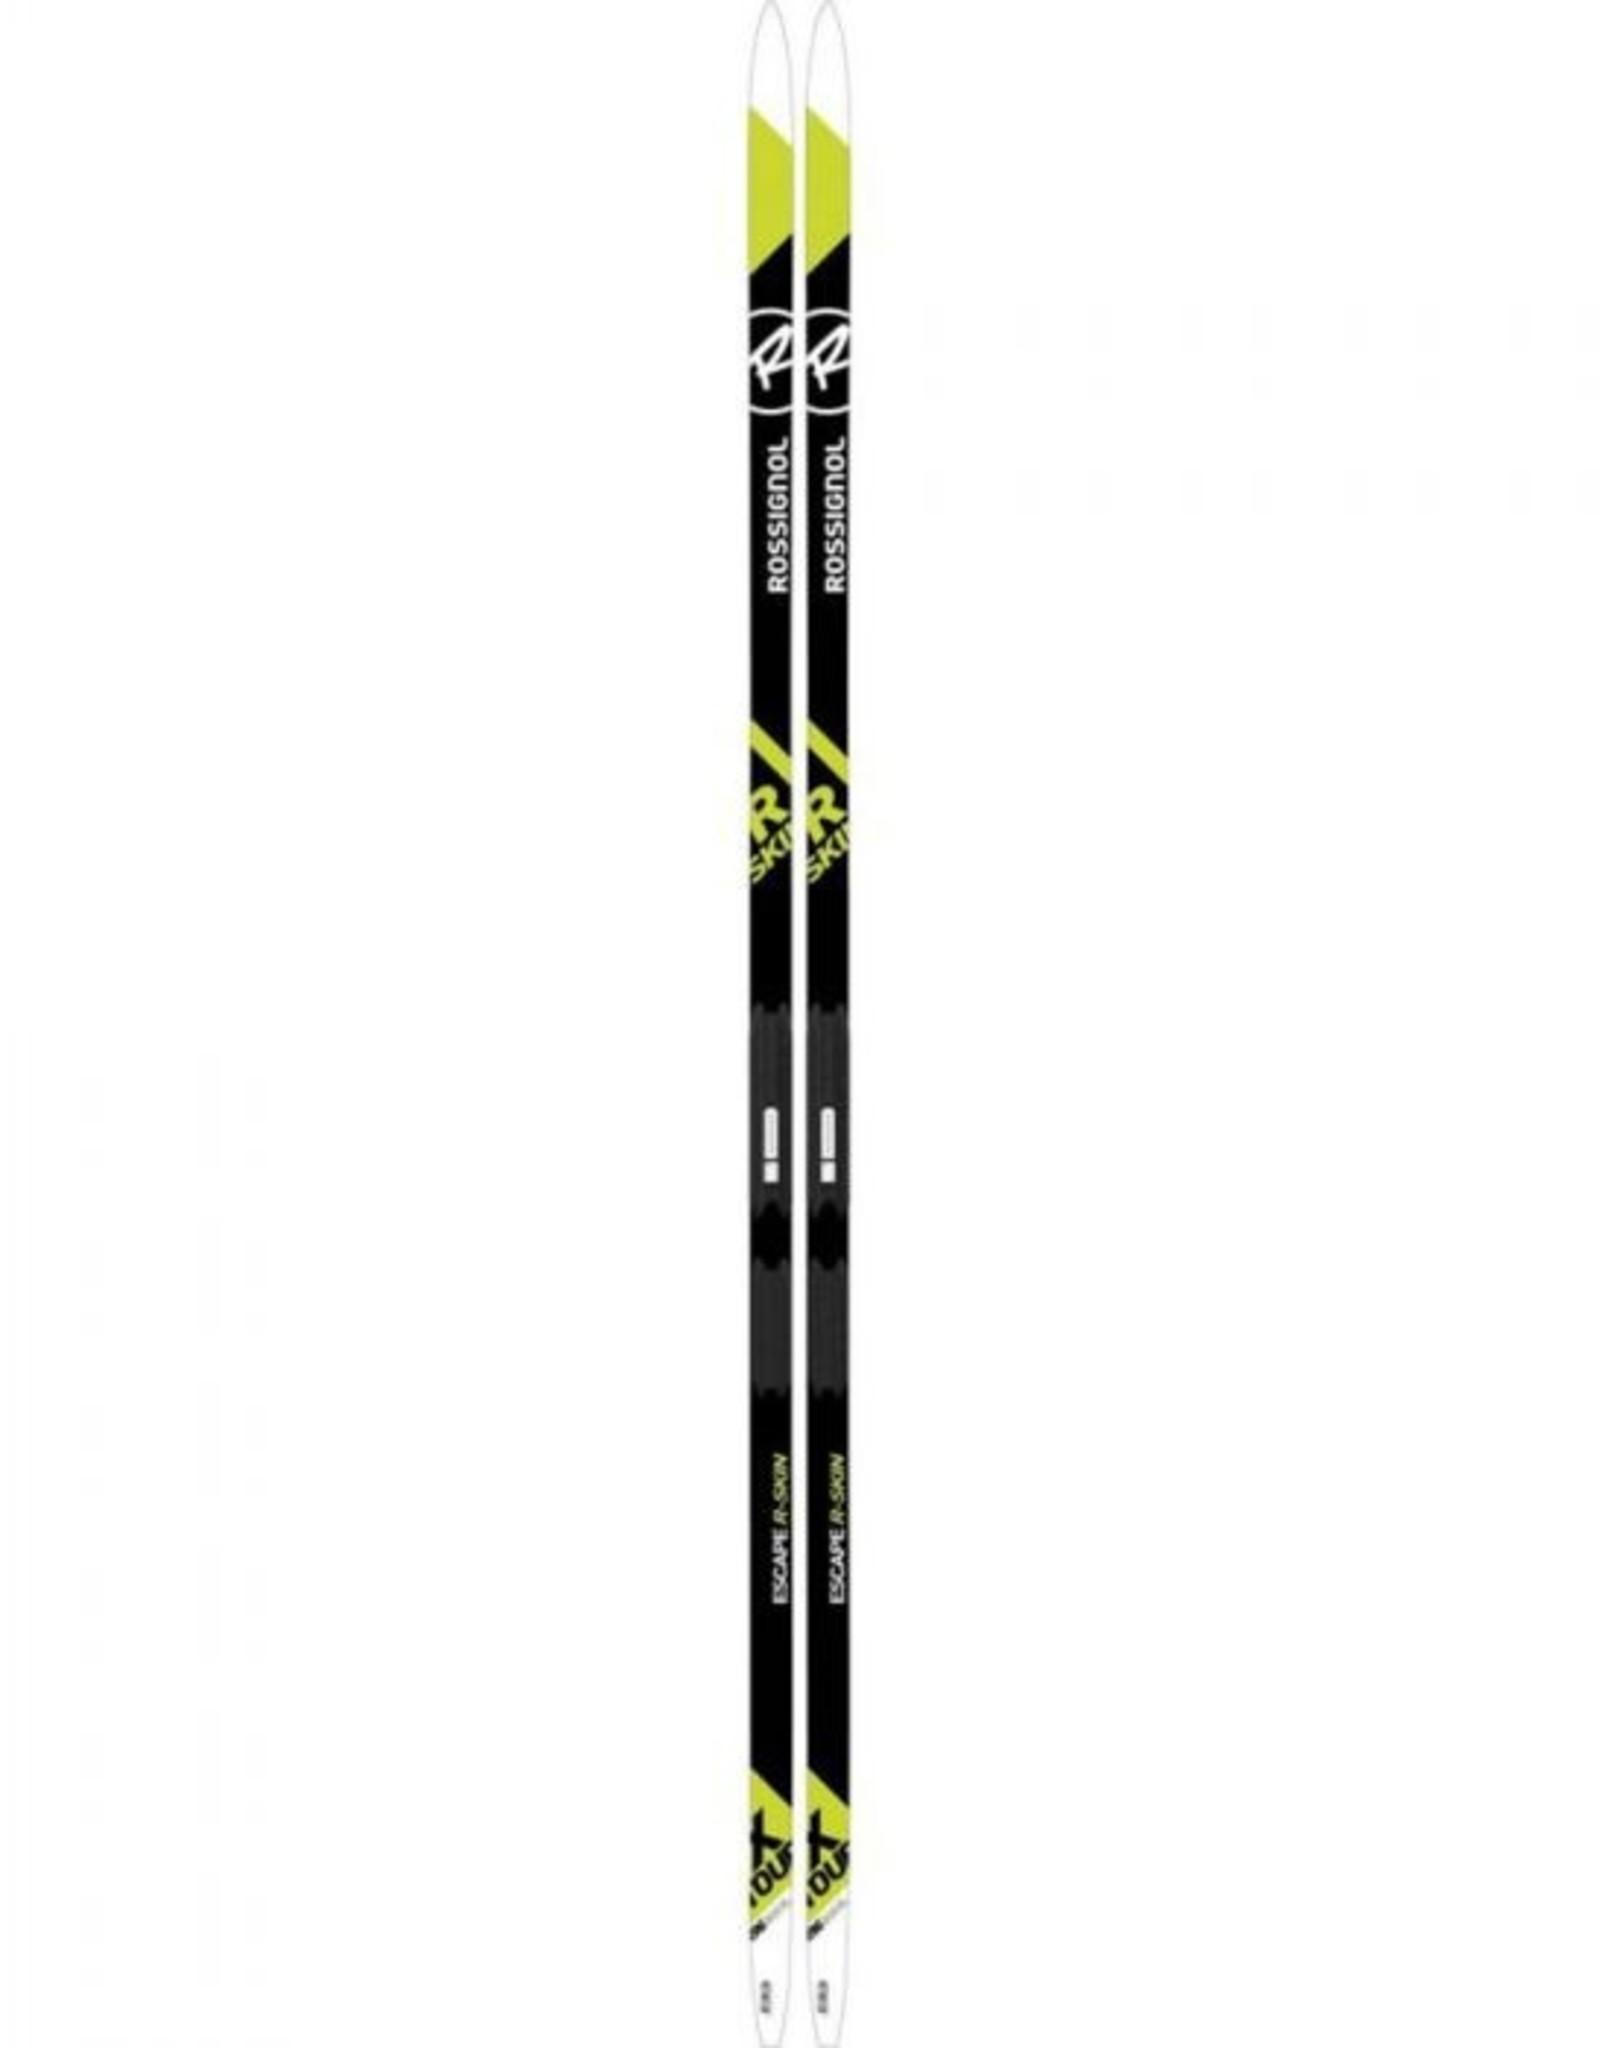 Rossignol Ski de Fond Rossignol X-Tour Escape R-Skin